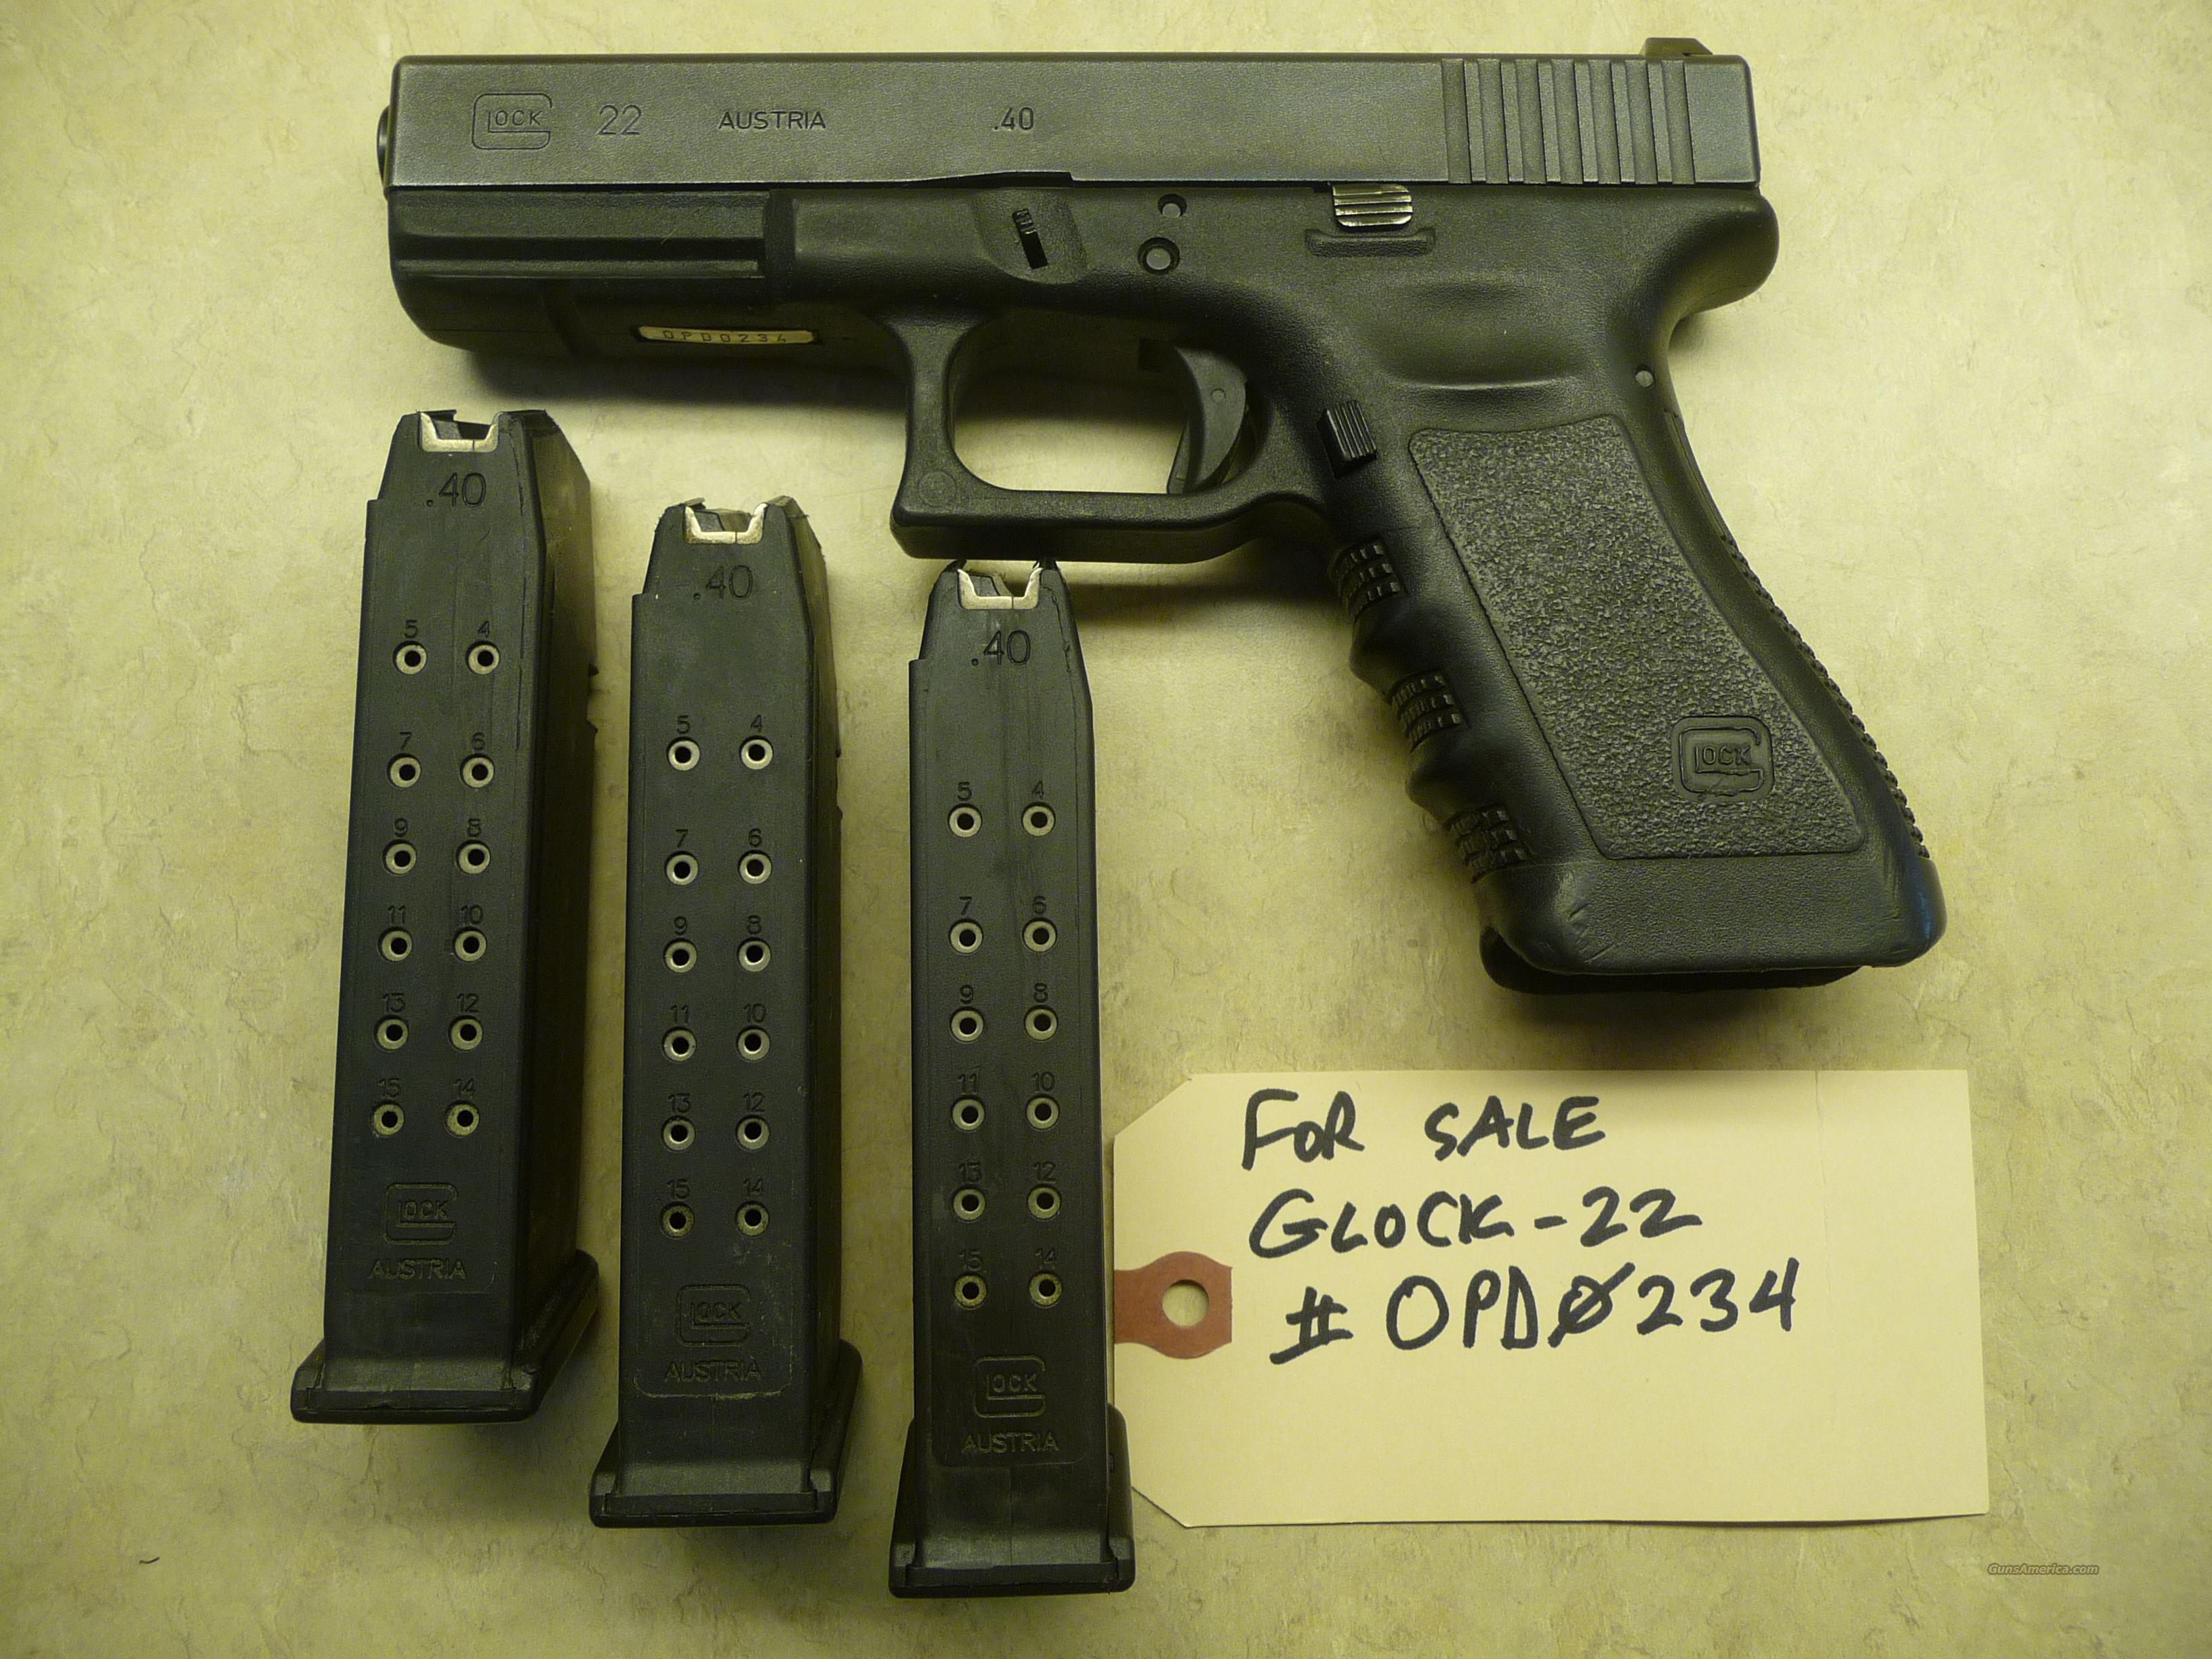 Used Gen 3 Glock 22 Police Trade In 40 Caliber For Sale